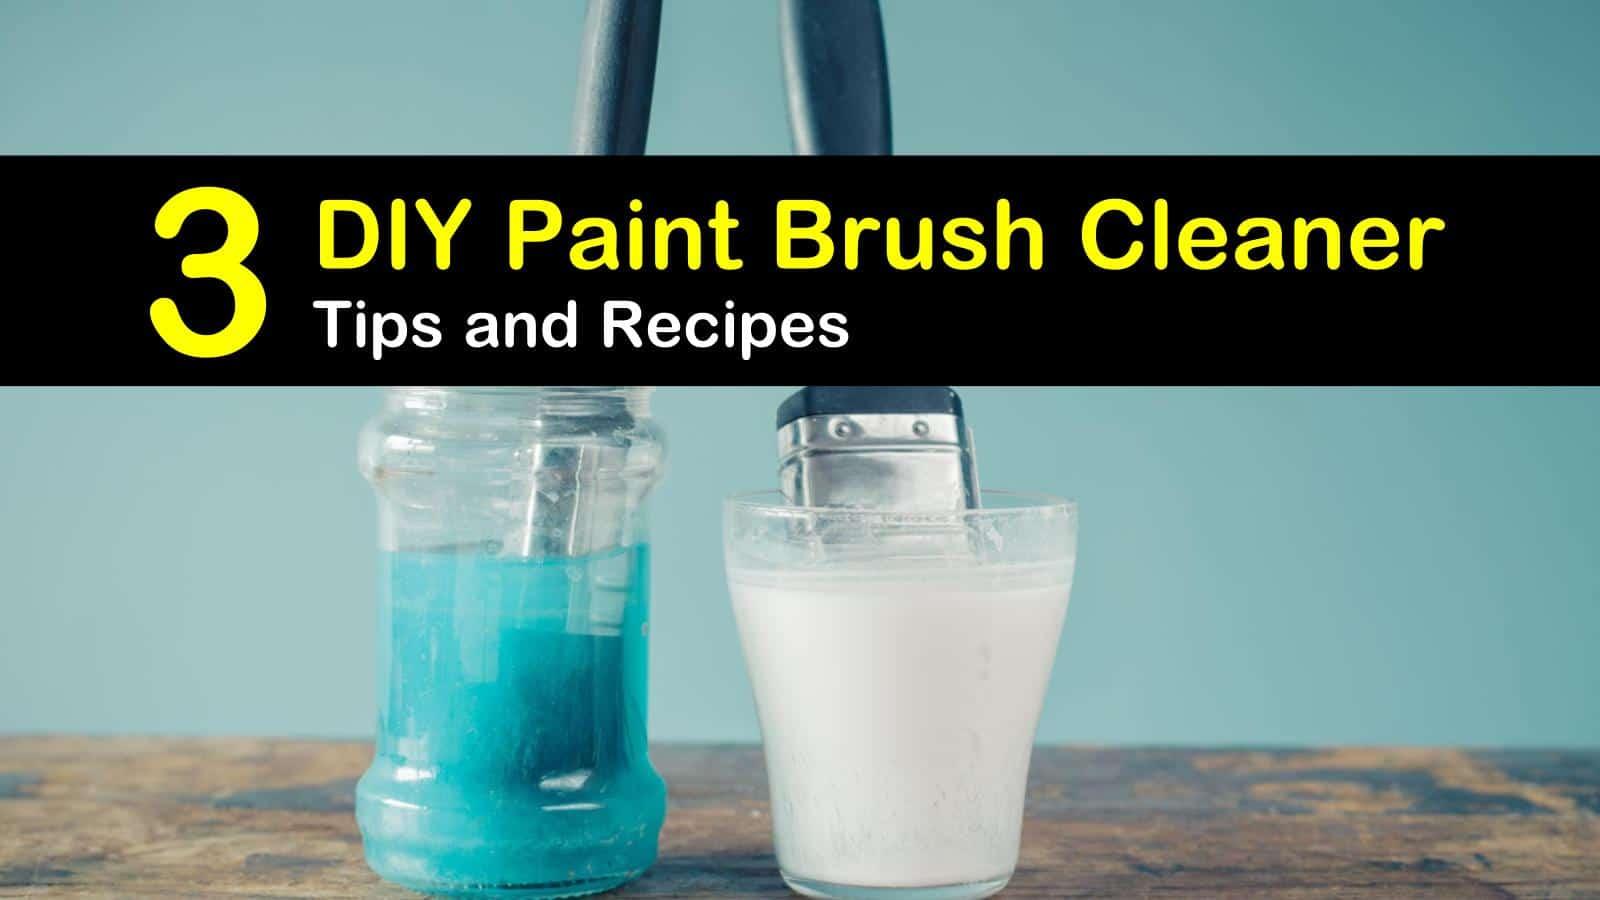 paint brush cleaner titleimg1